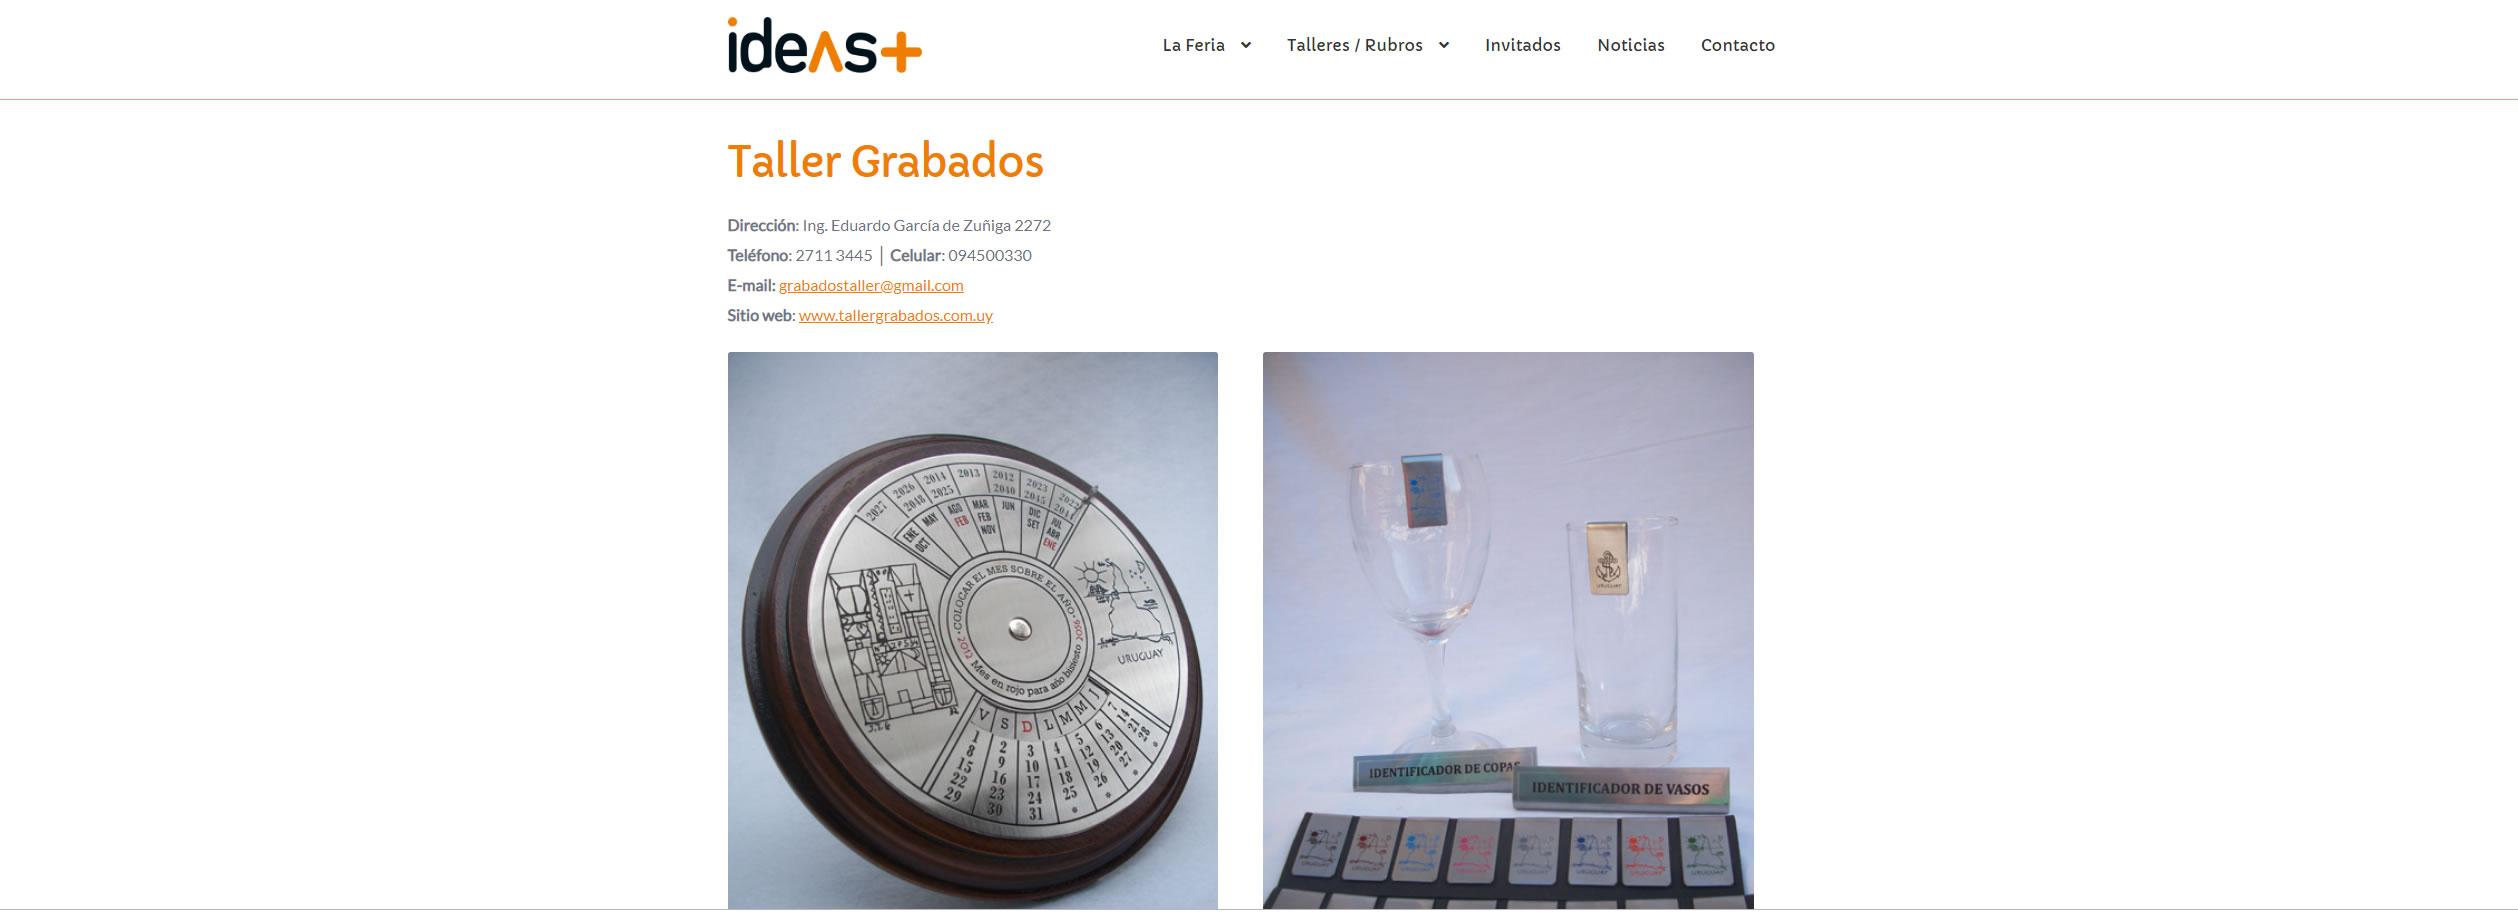 idea_mas_galeria_de_gravura